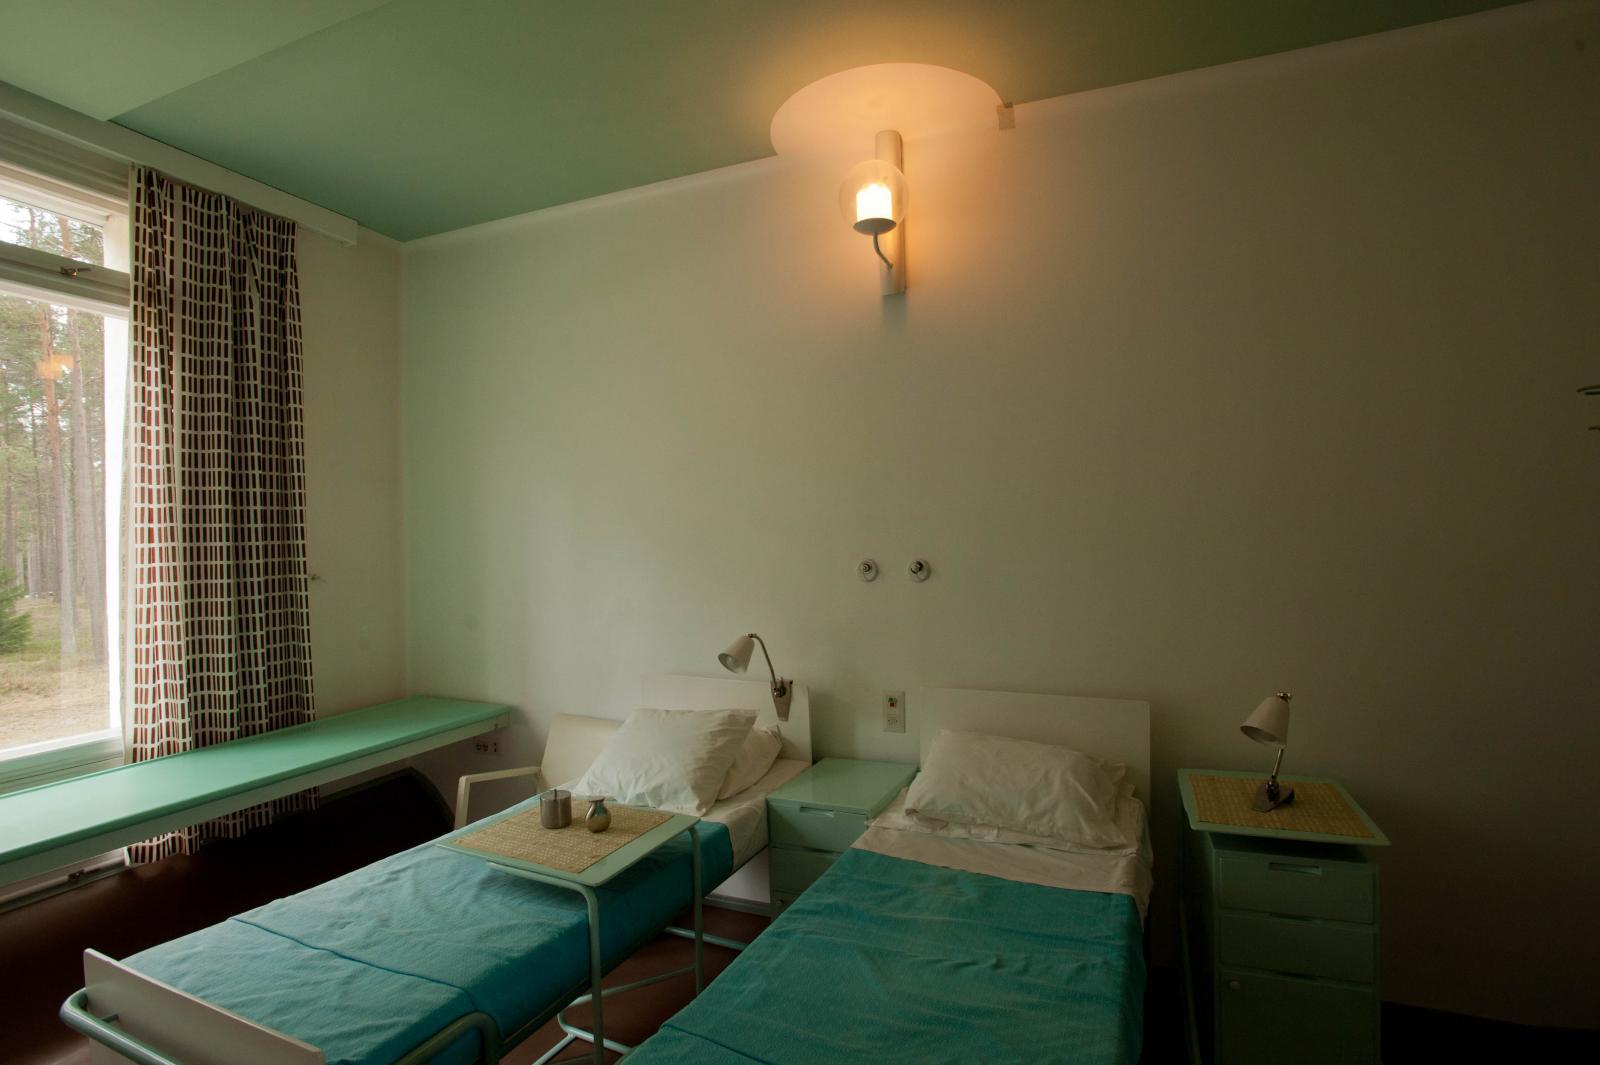 Alvar Aalto's famous Finnish sanatorium is for sale